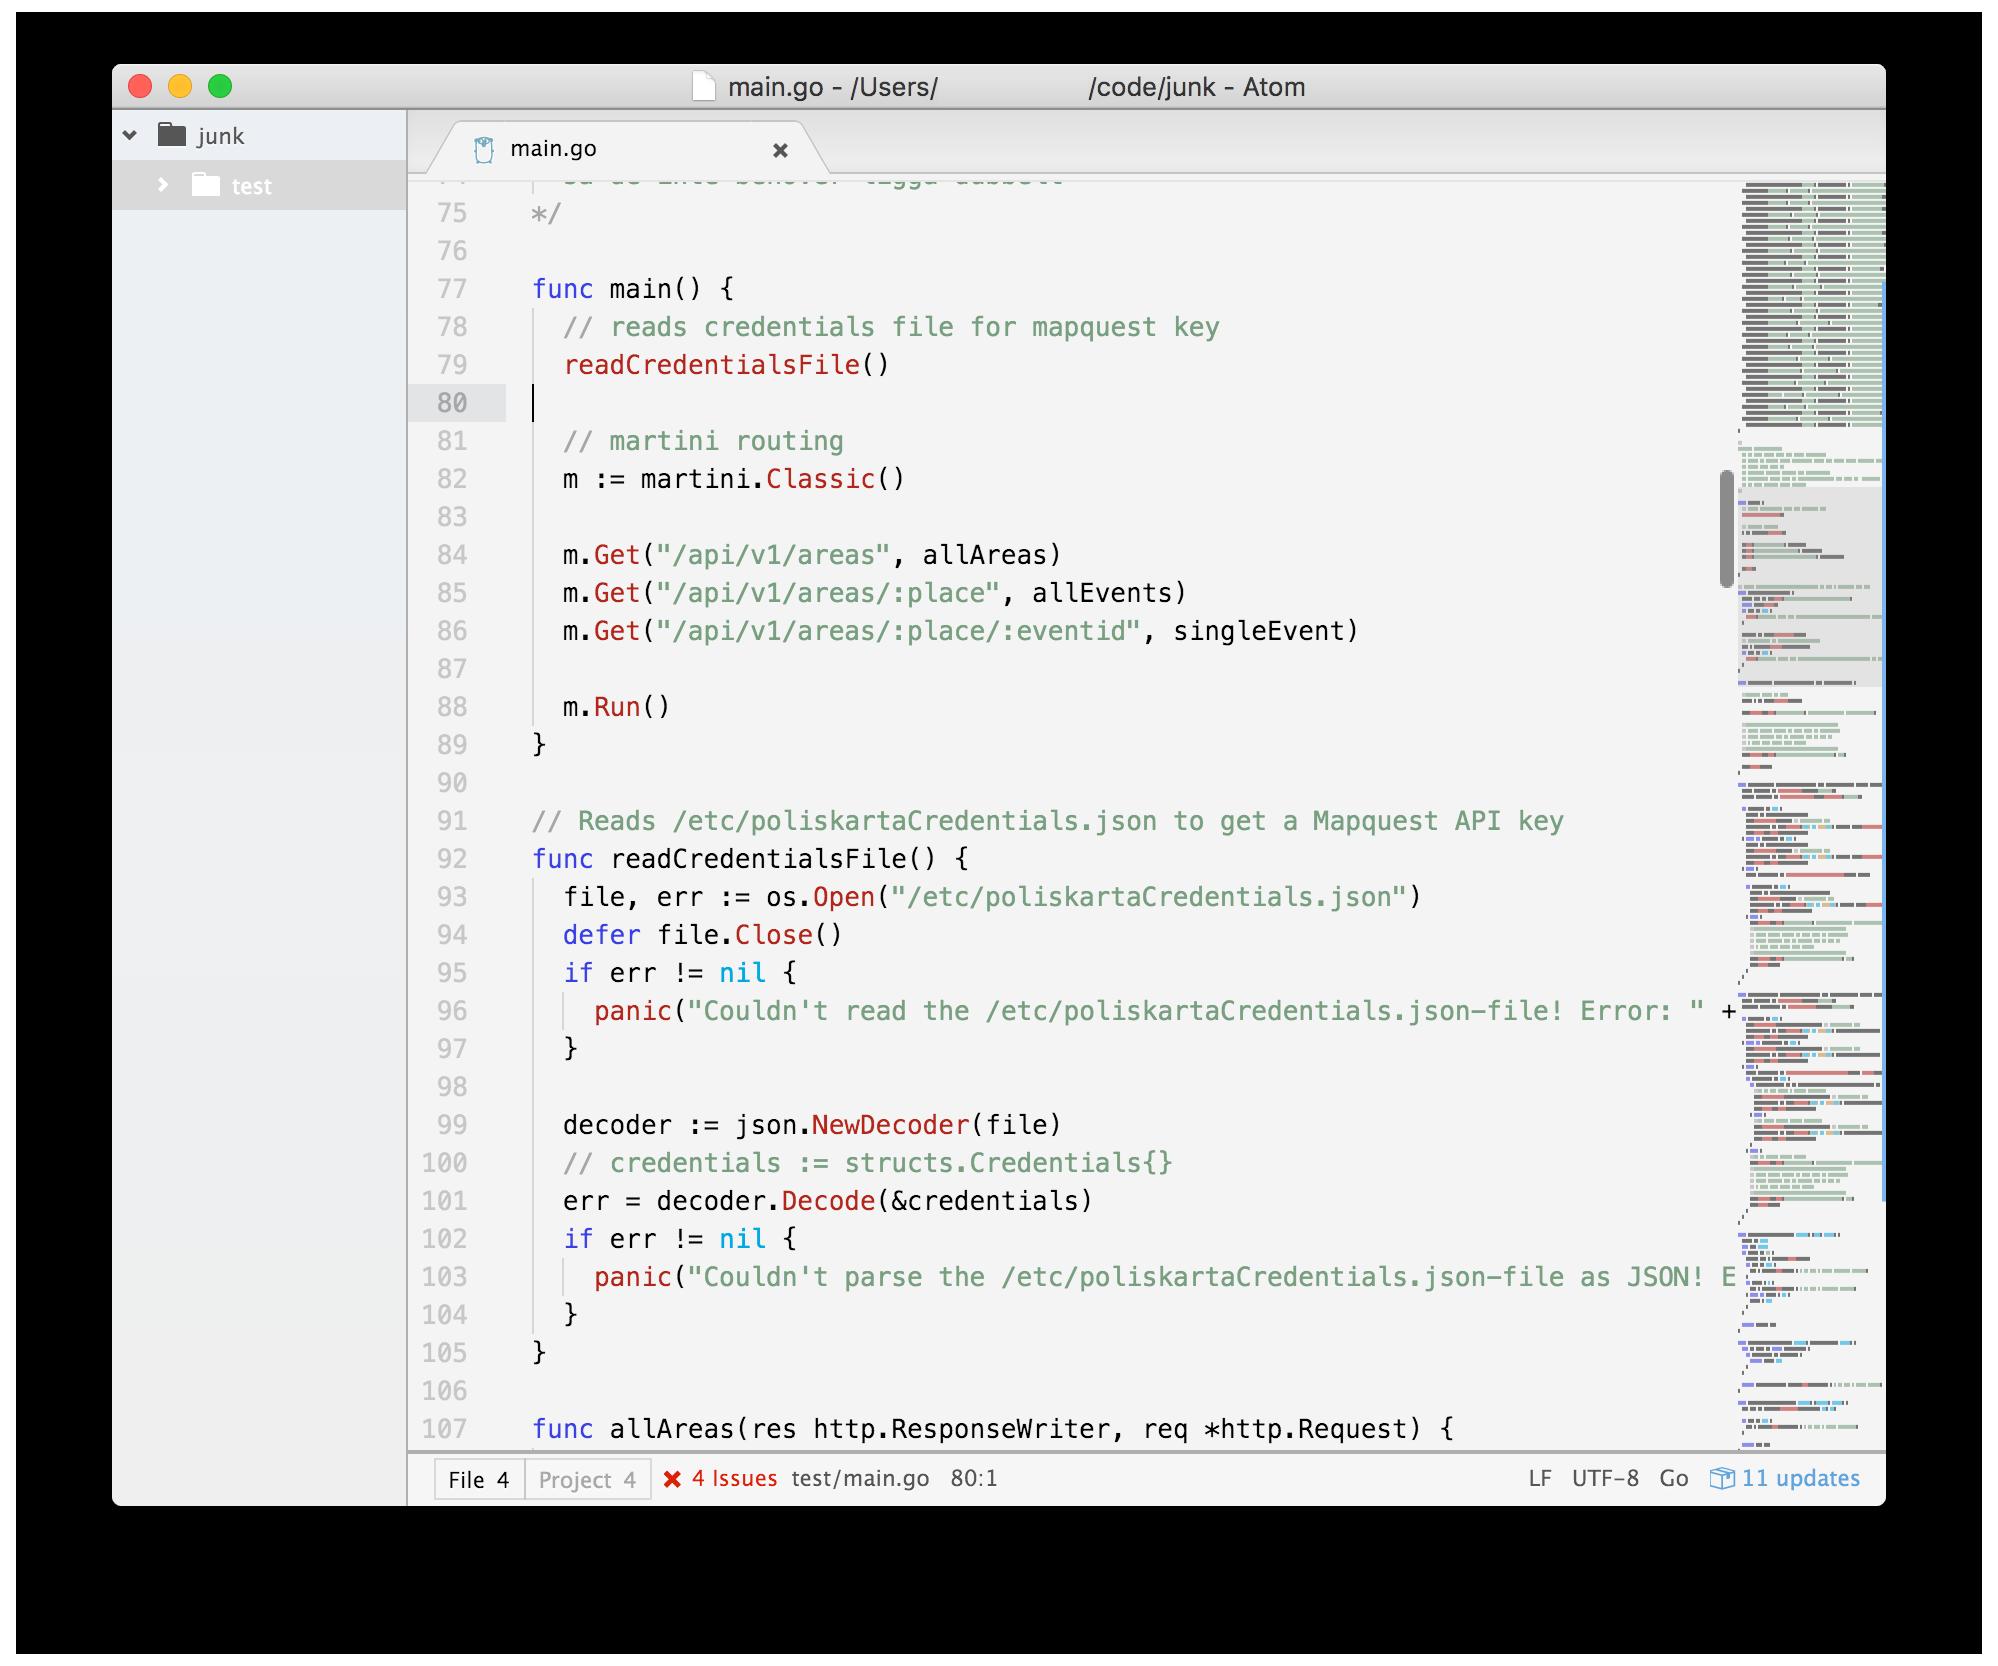 A screenshot of the theme